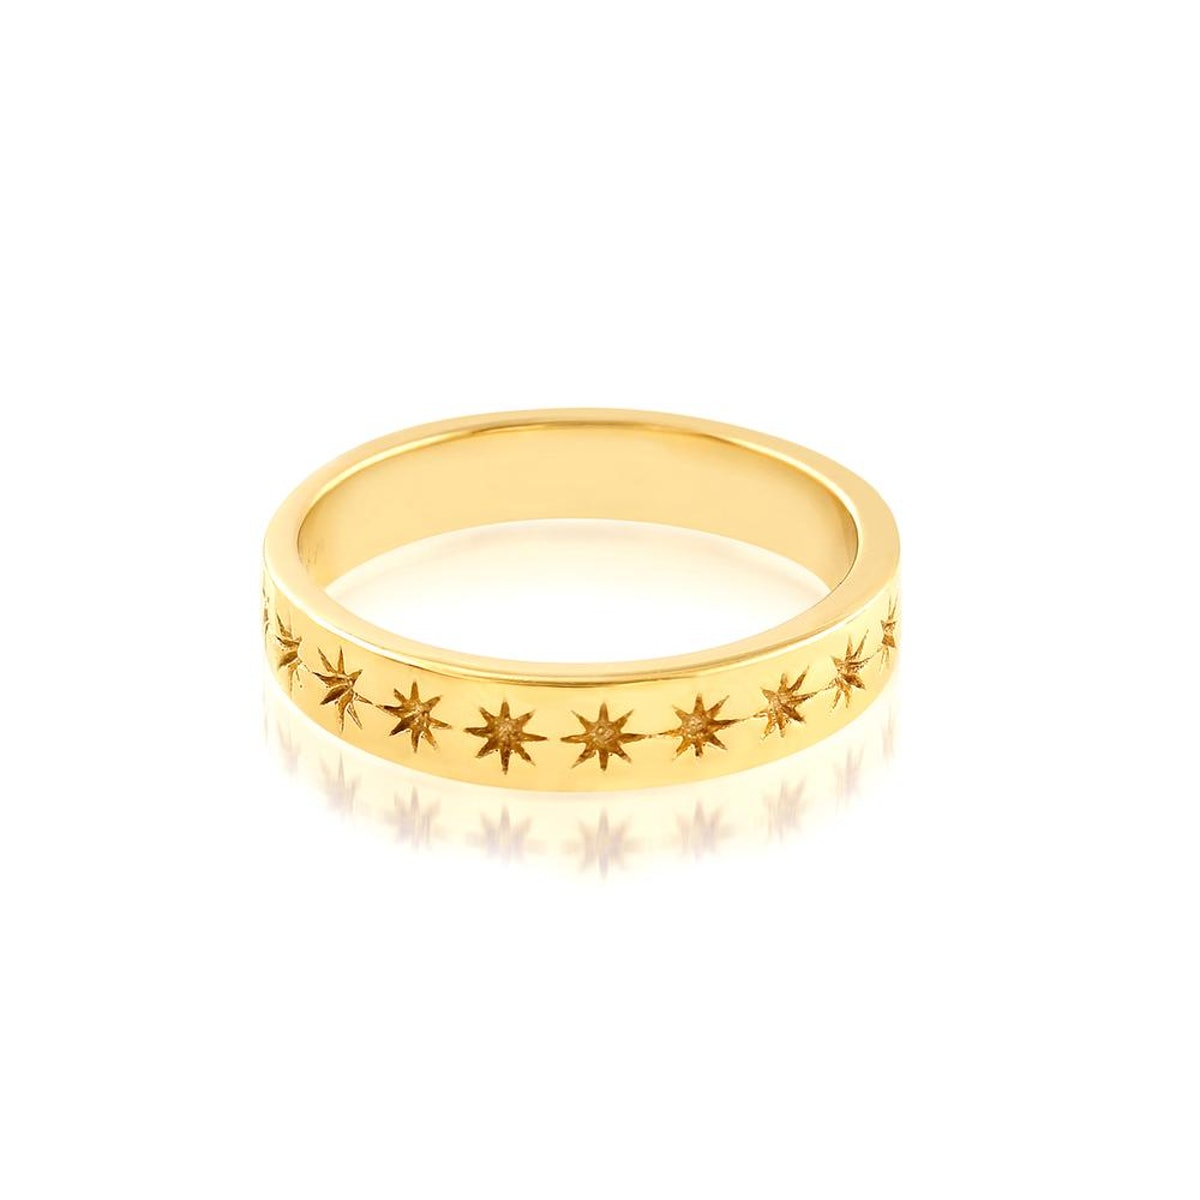 STELLAR RING - 18 KARAT GOLD VERMEIL